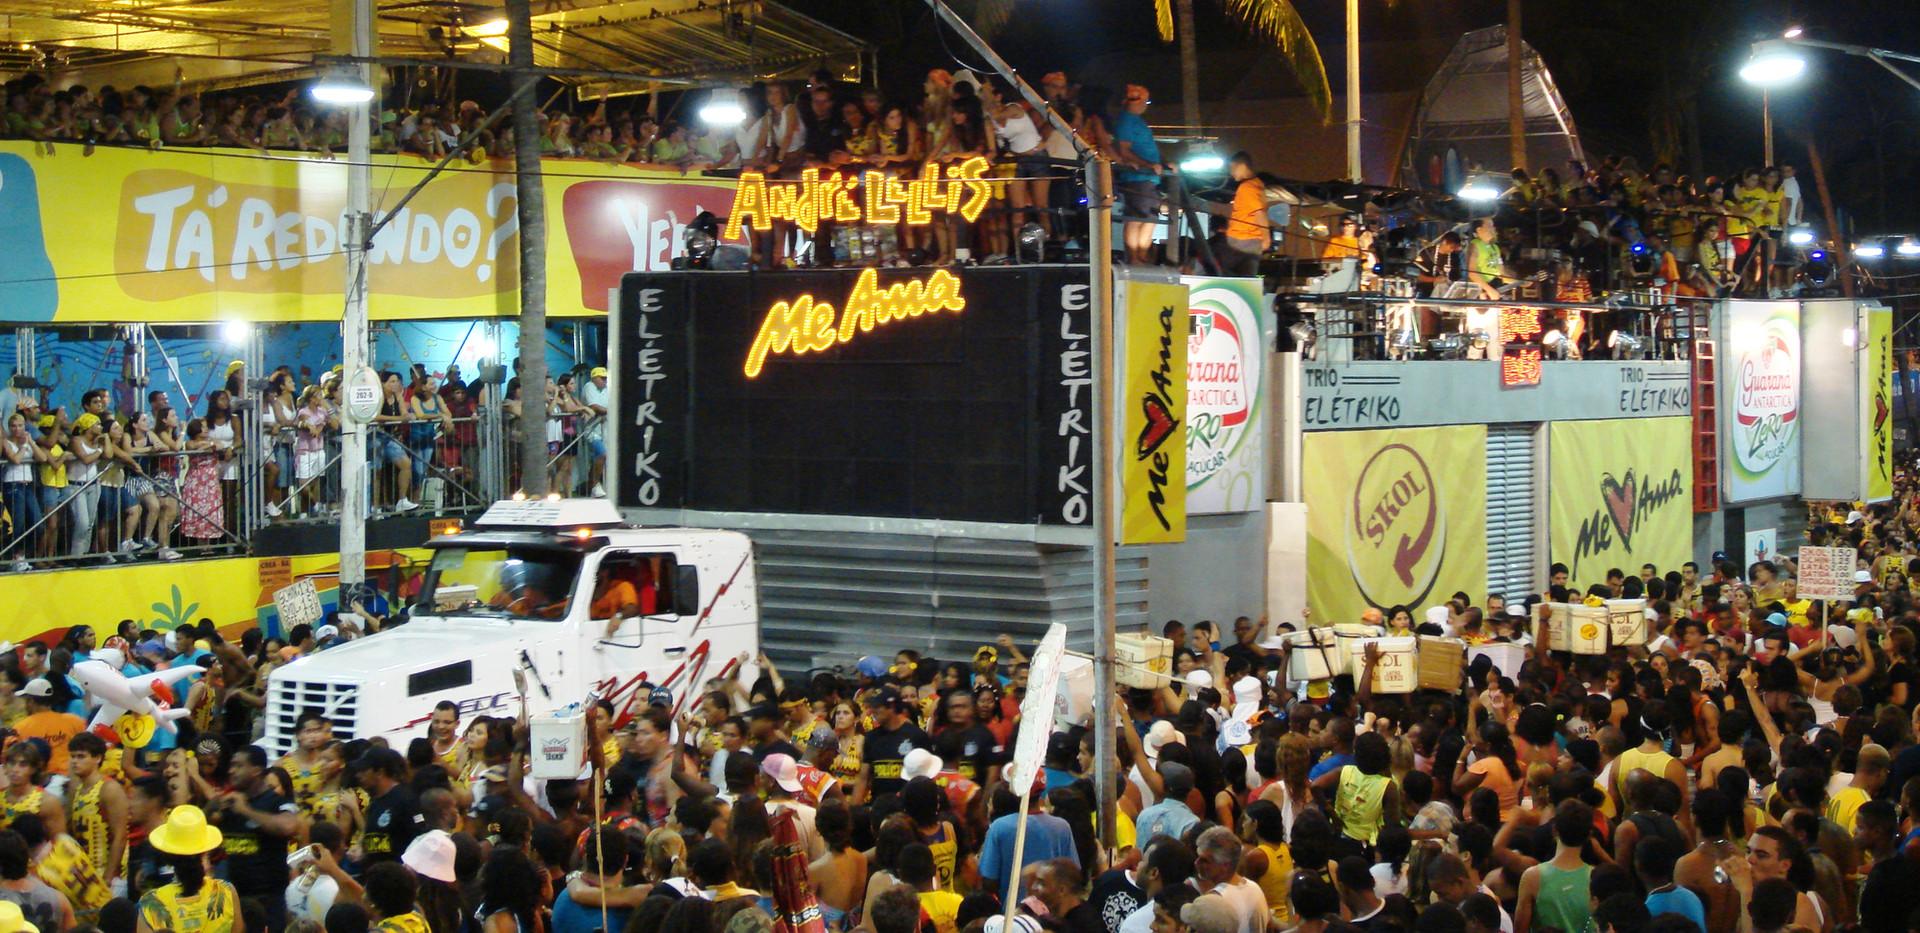 Carnival Trio Electrio and viewing area[